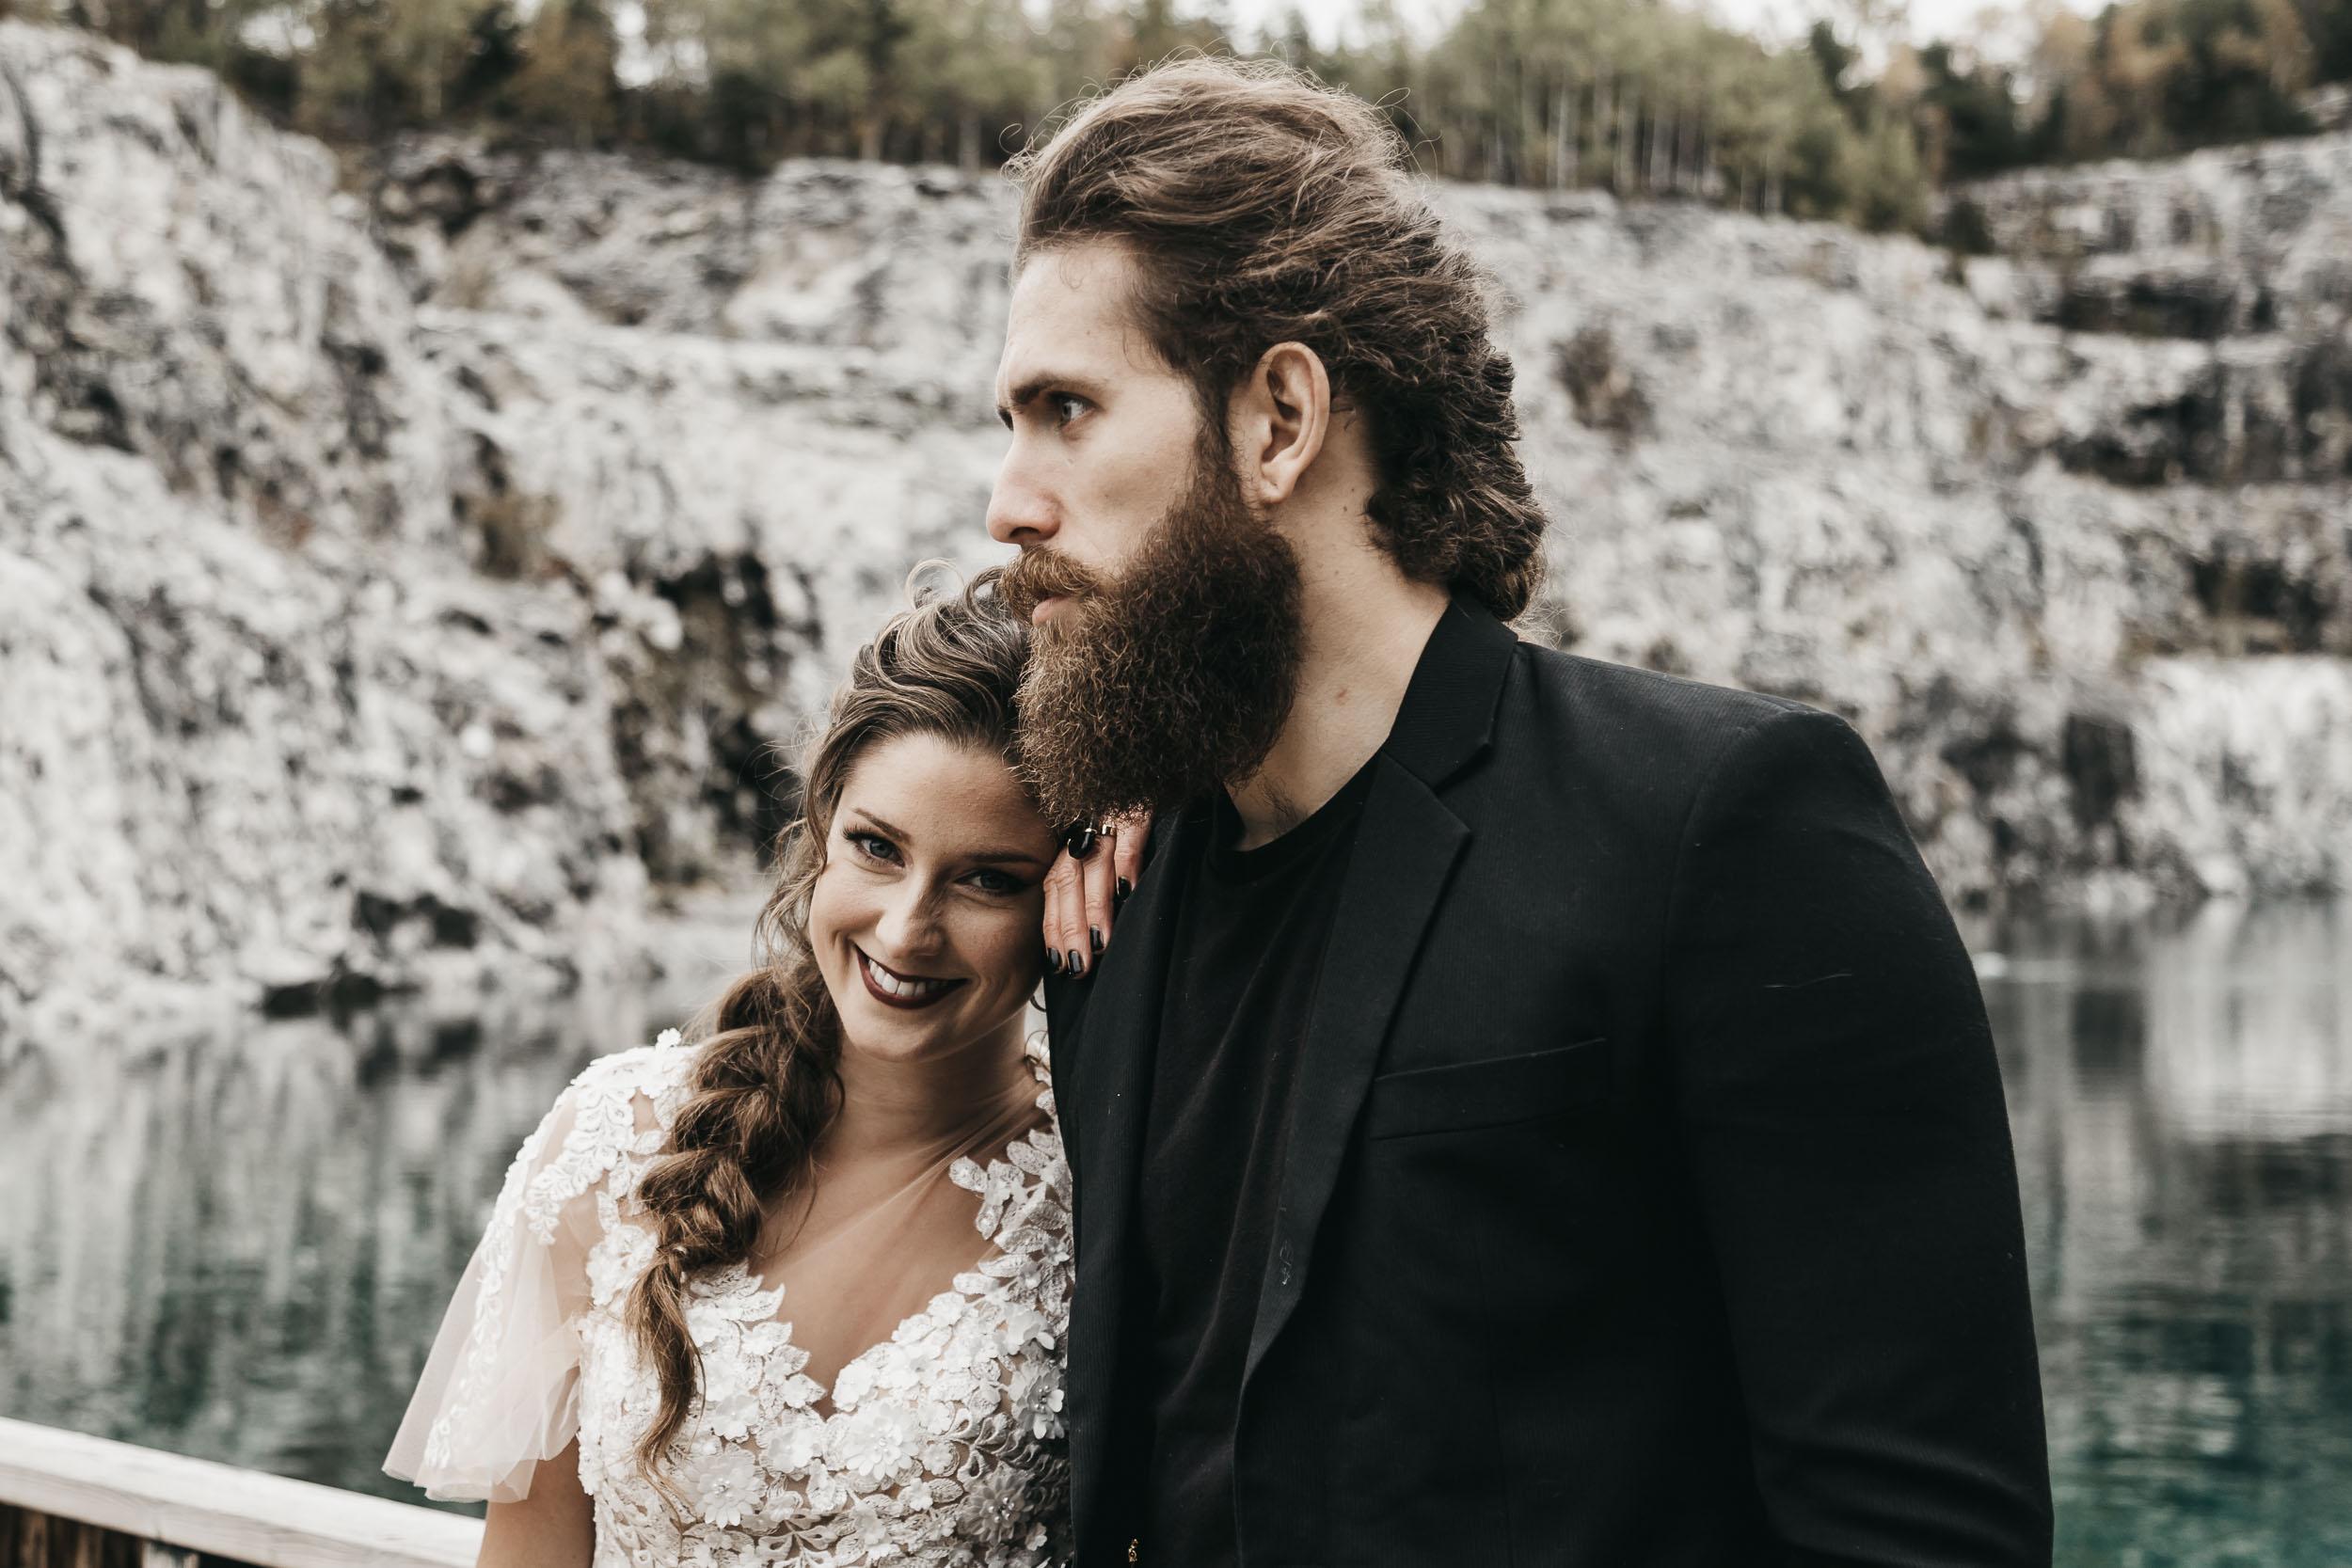 intimate-wedding-elopement-photographer-ottawa-toronto-0221.jpg